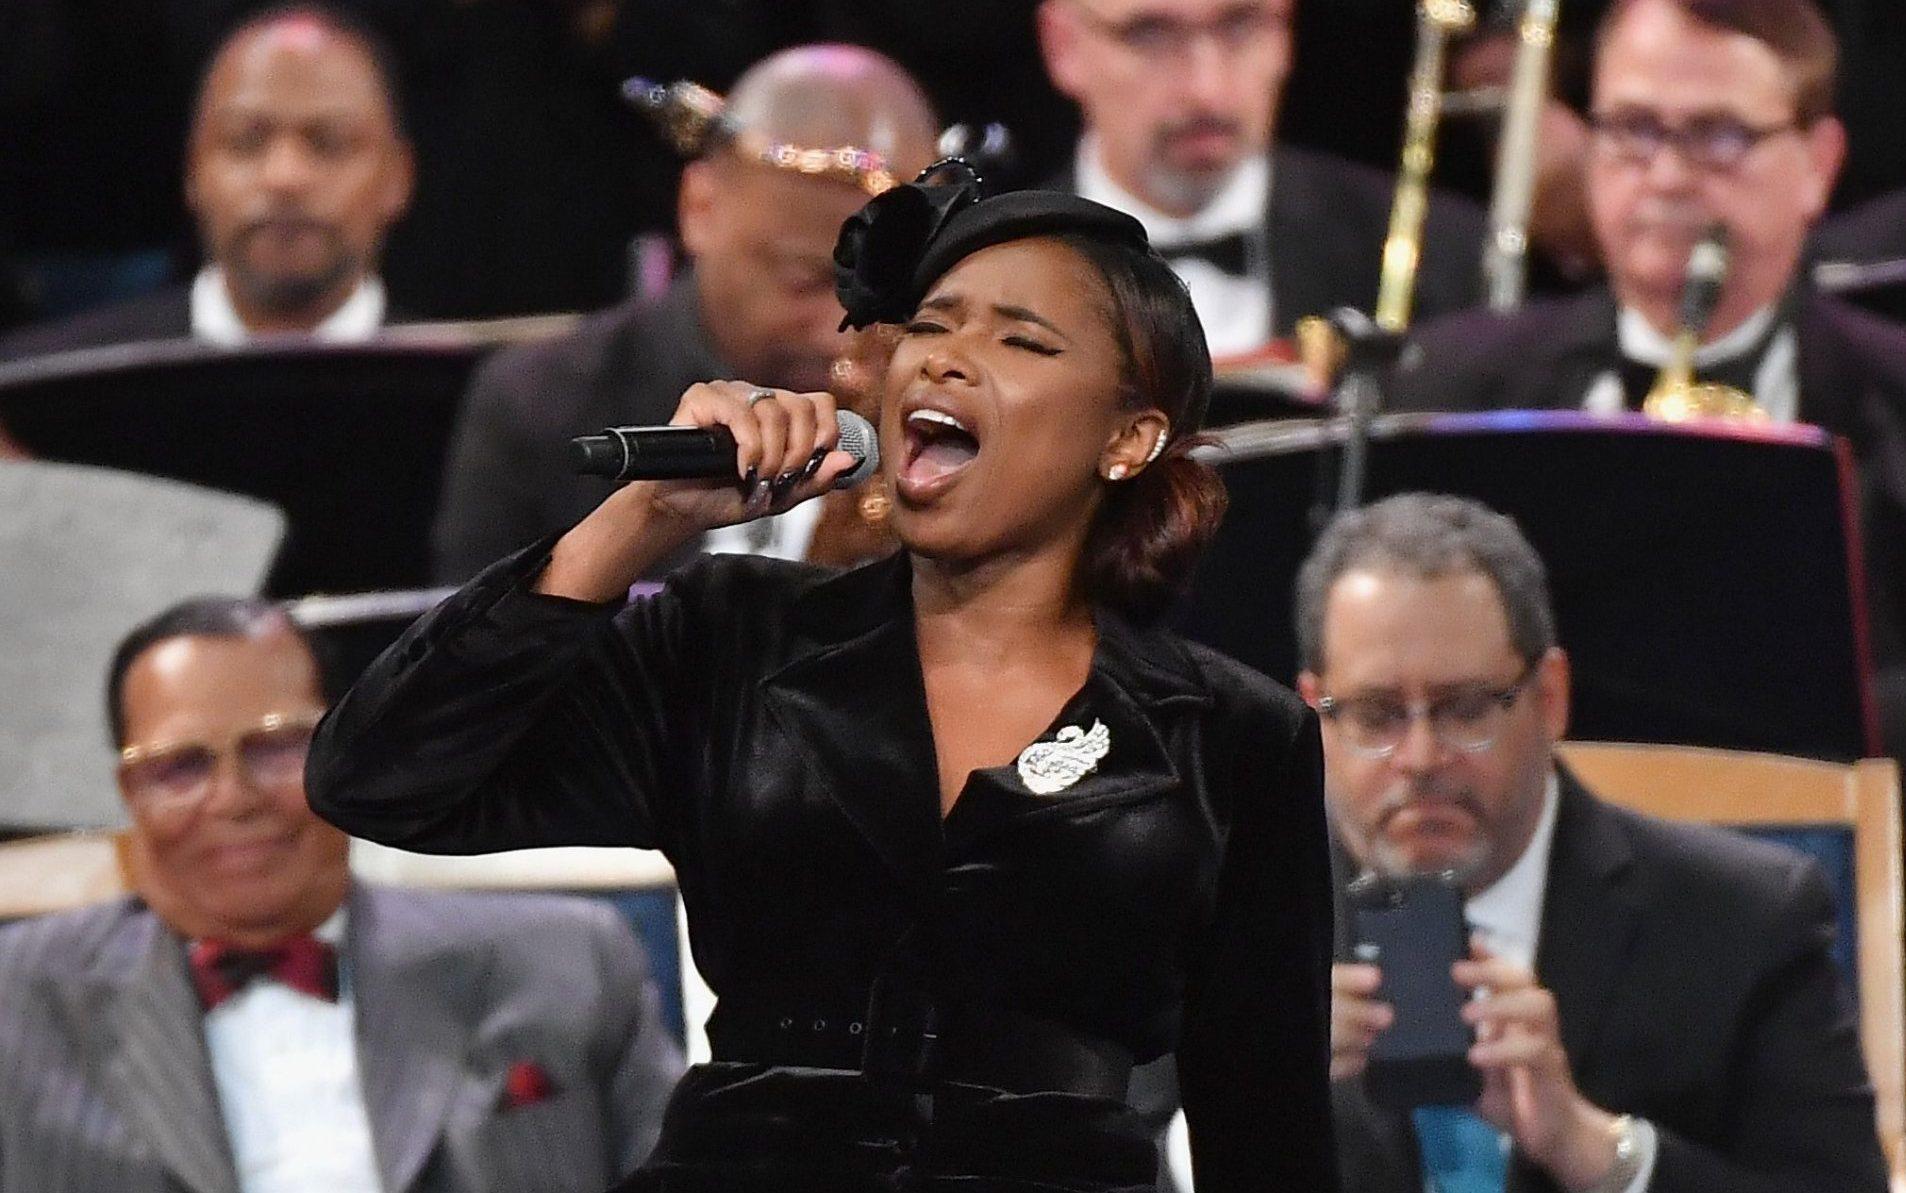 Jennifer Hudson delivers stunning rendition of Amazing Grace at Aretha Franklin's funeral